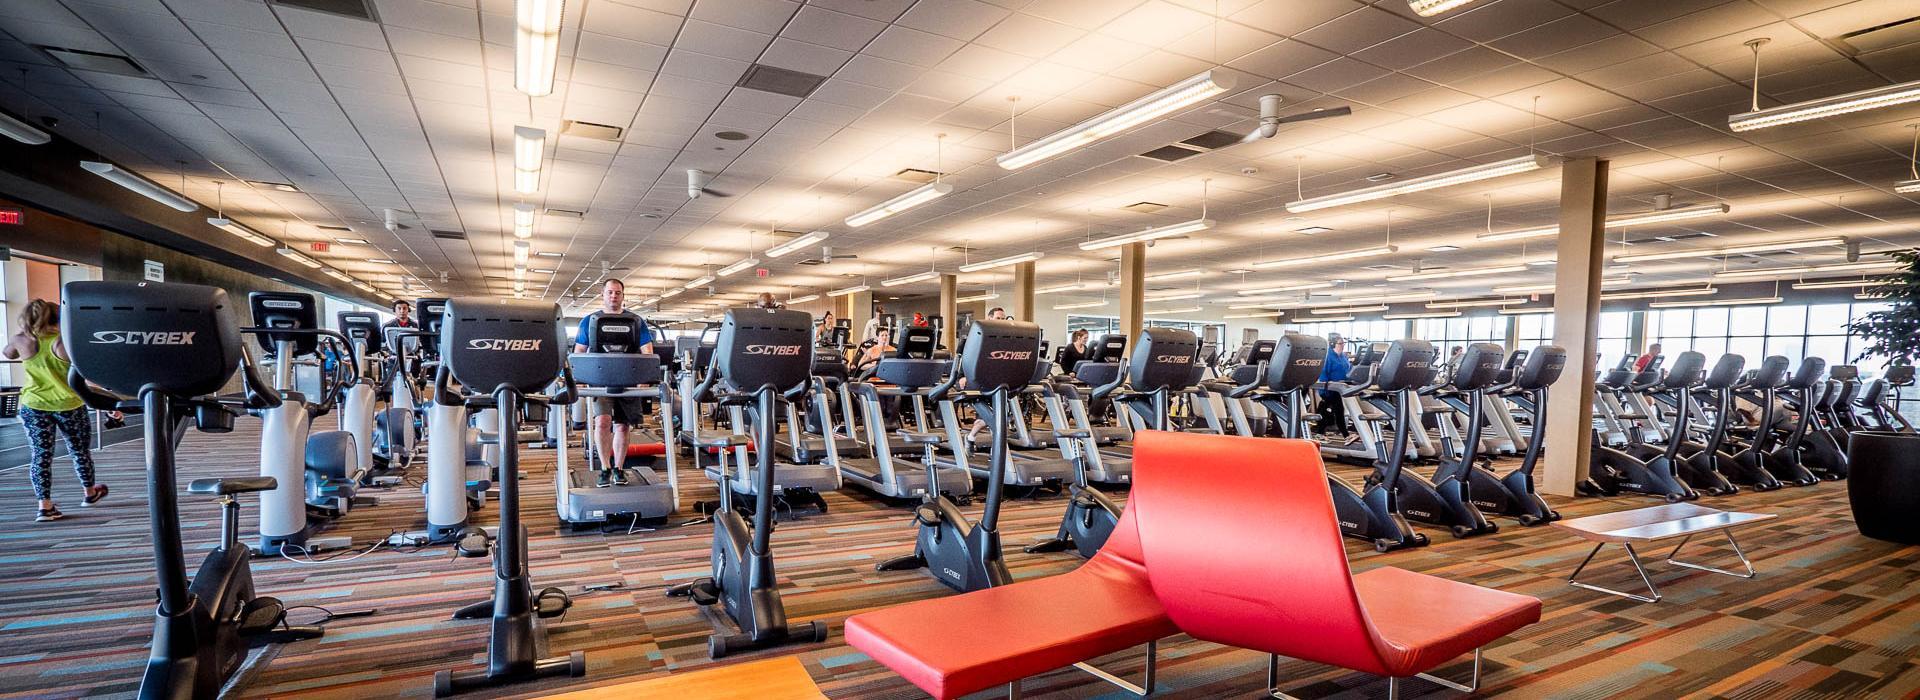 GREATER WICHITA YMCA | Robert D  Love Downtown YMCA, 402 N